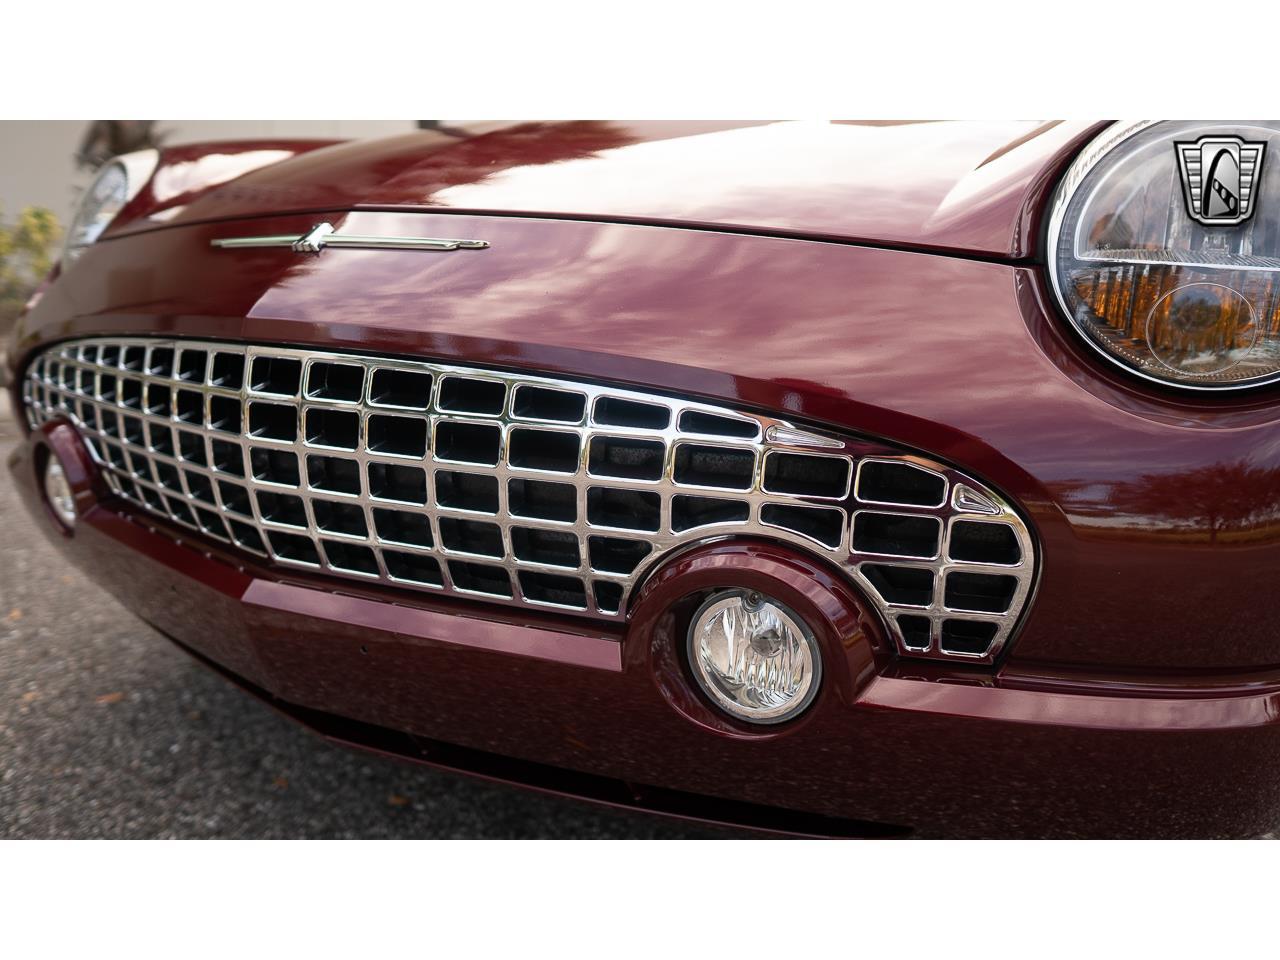 2004 Ford Thunderbird (CC-1415217) for sale in O'Fallon, Illinois